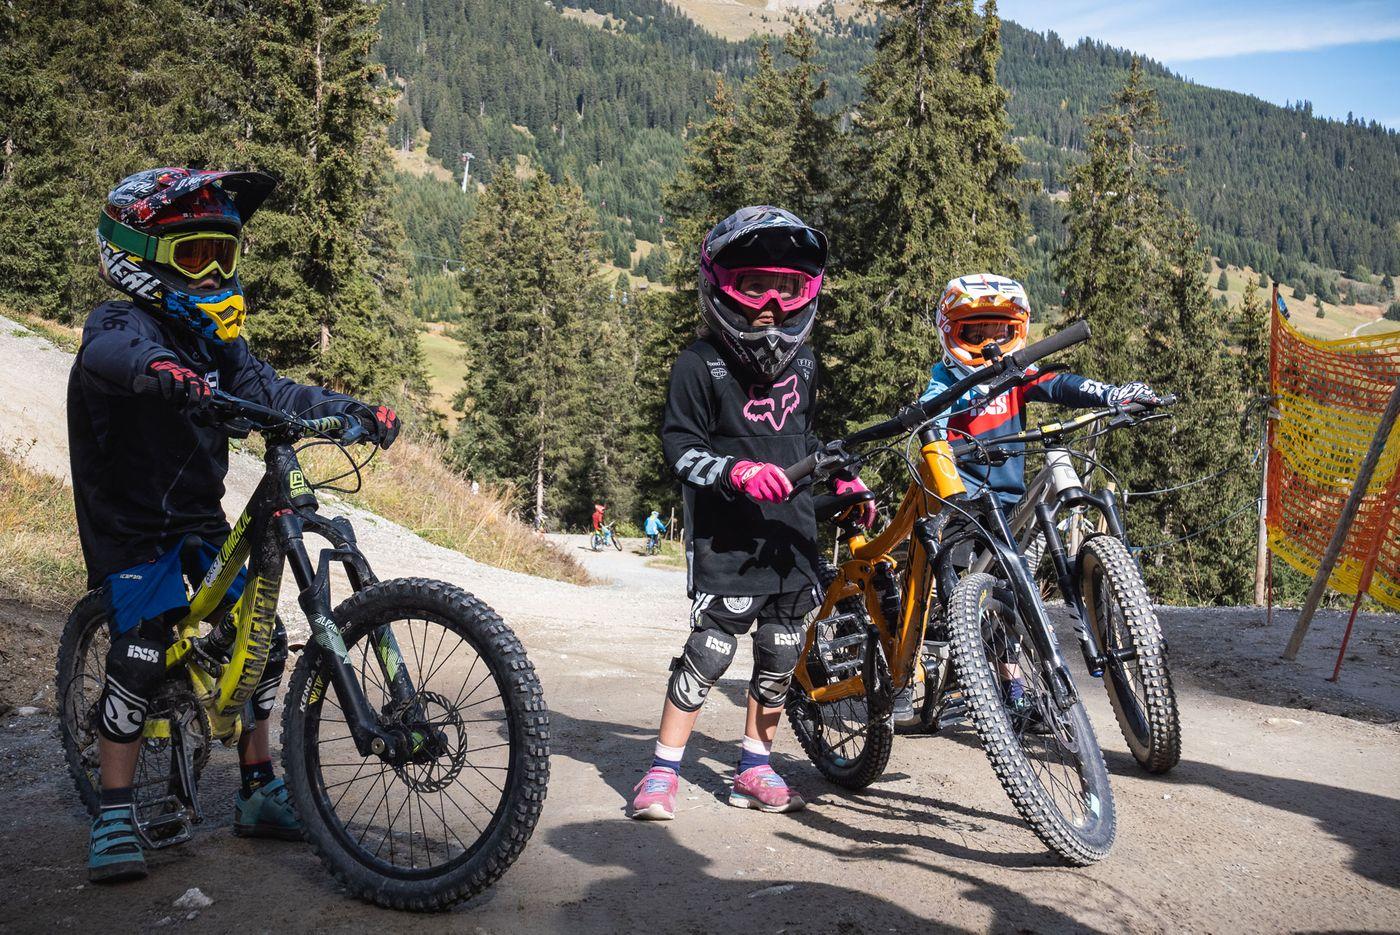 201910-BORNmag-BikeparkSFL-Familyday-Print-BAUSE-043